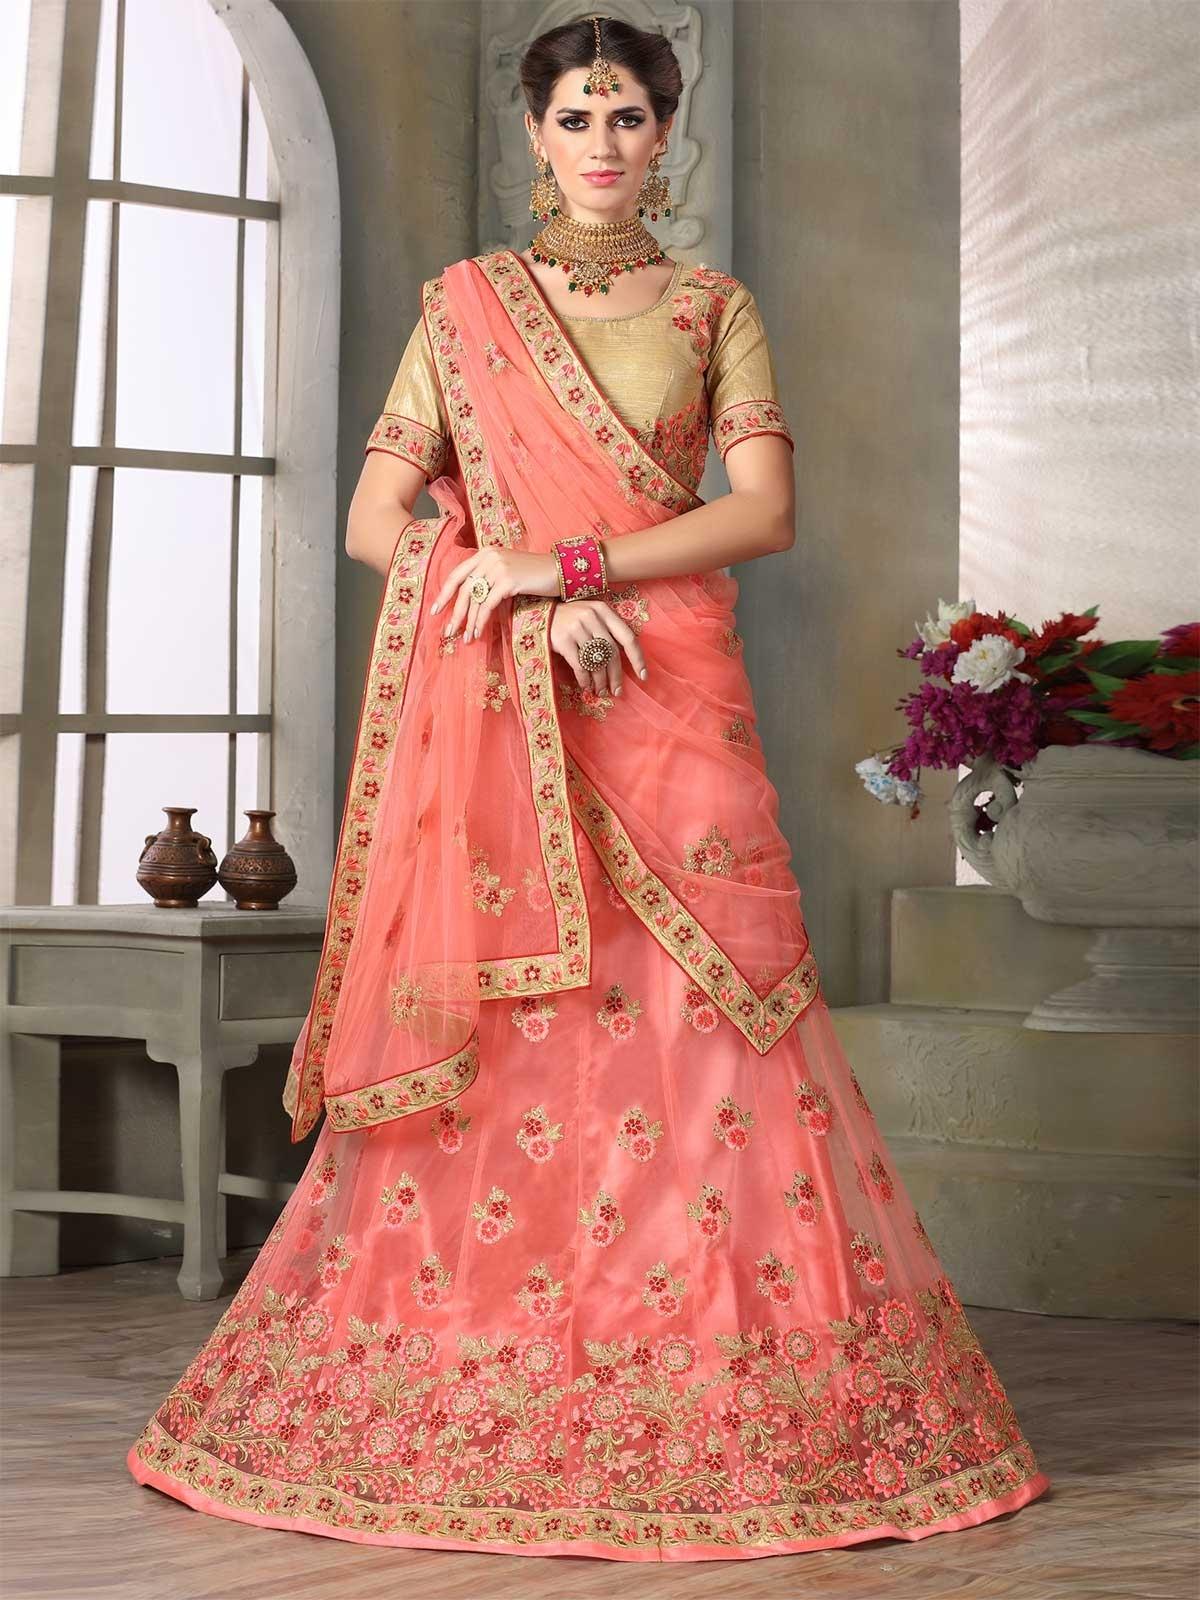 indian wedding dresses online photo - 1